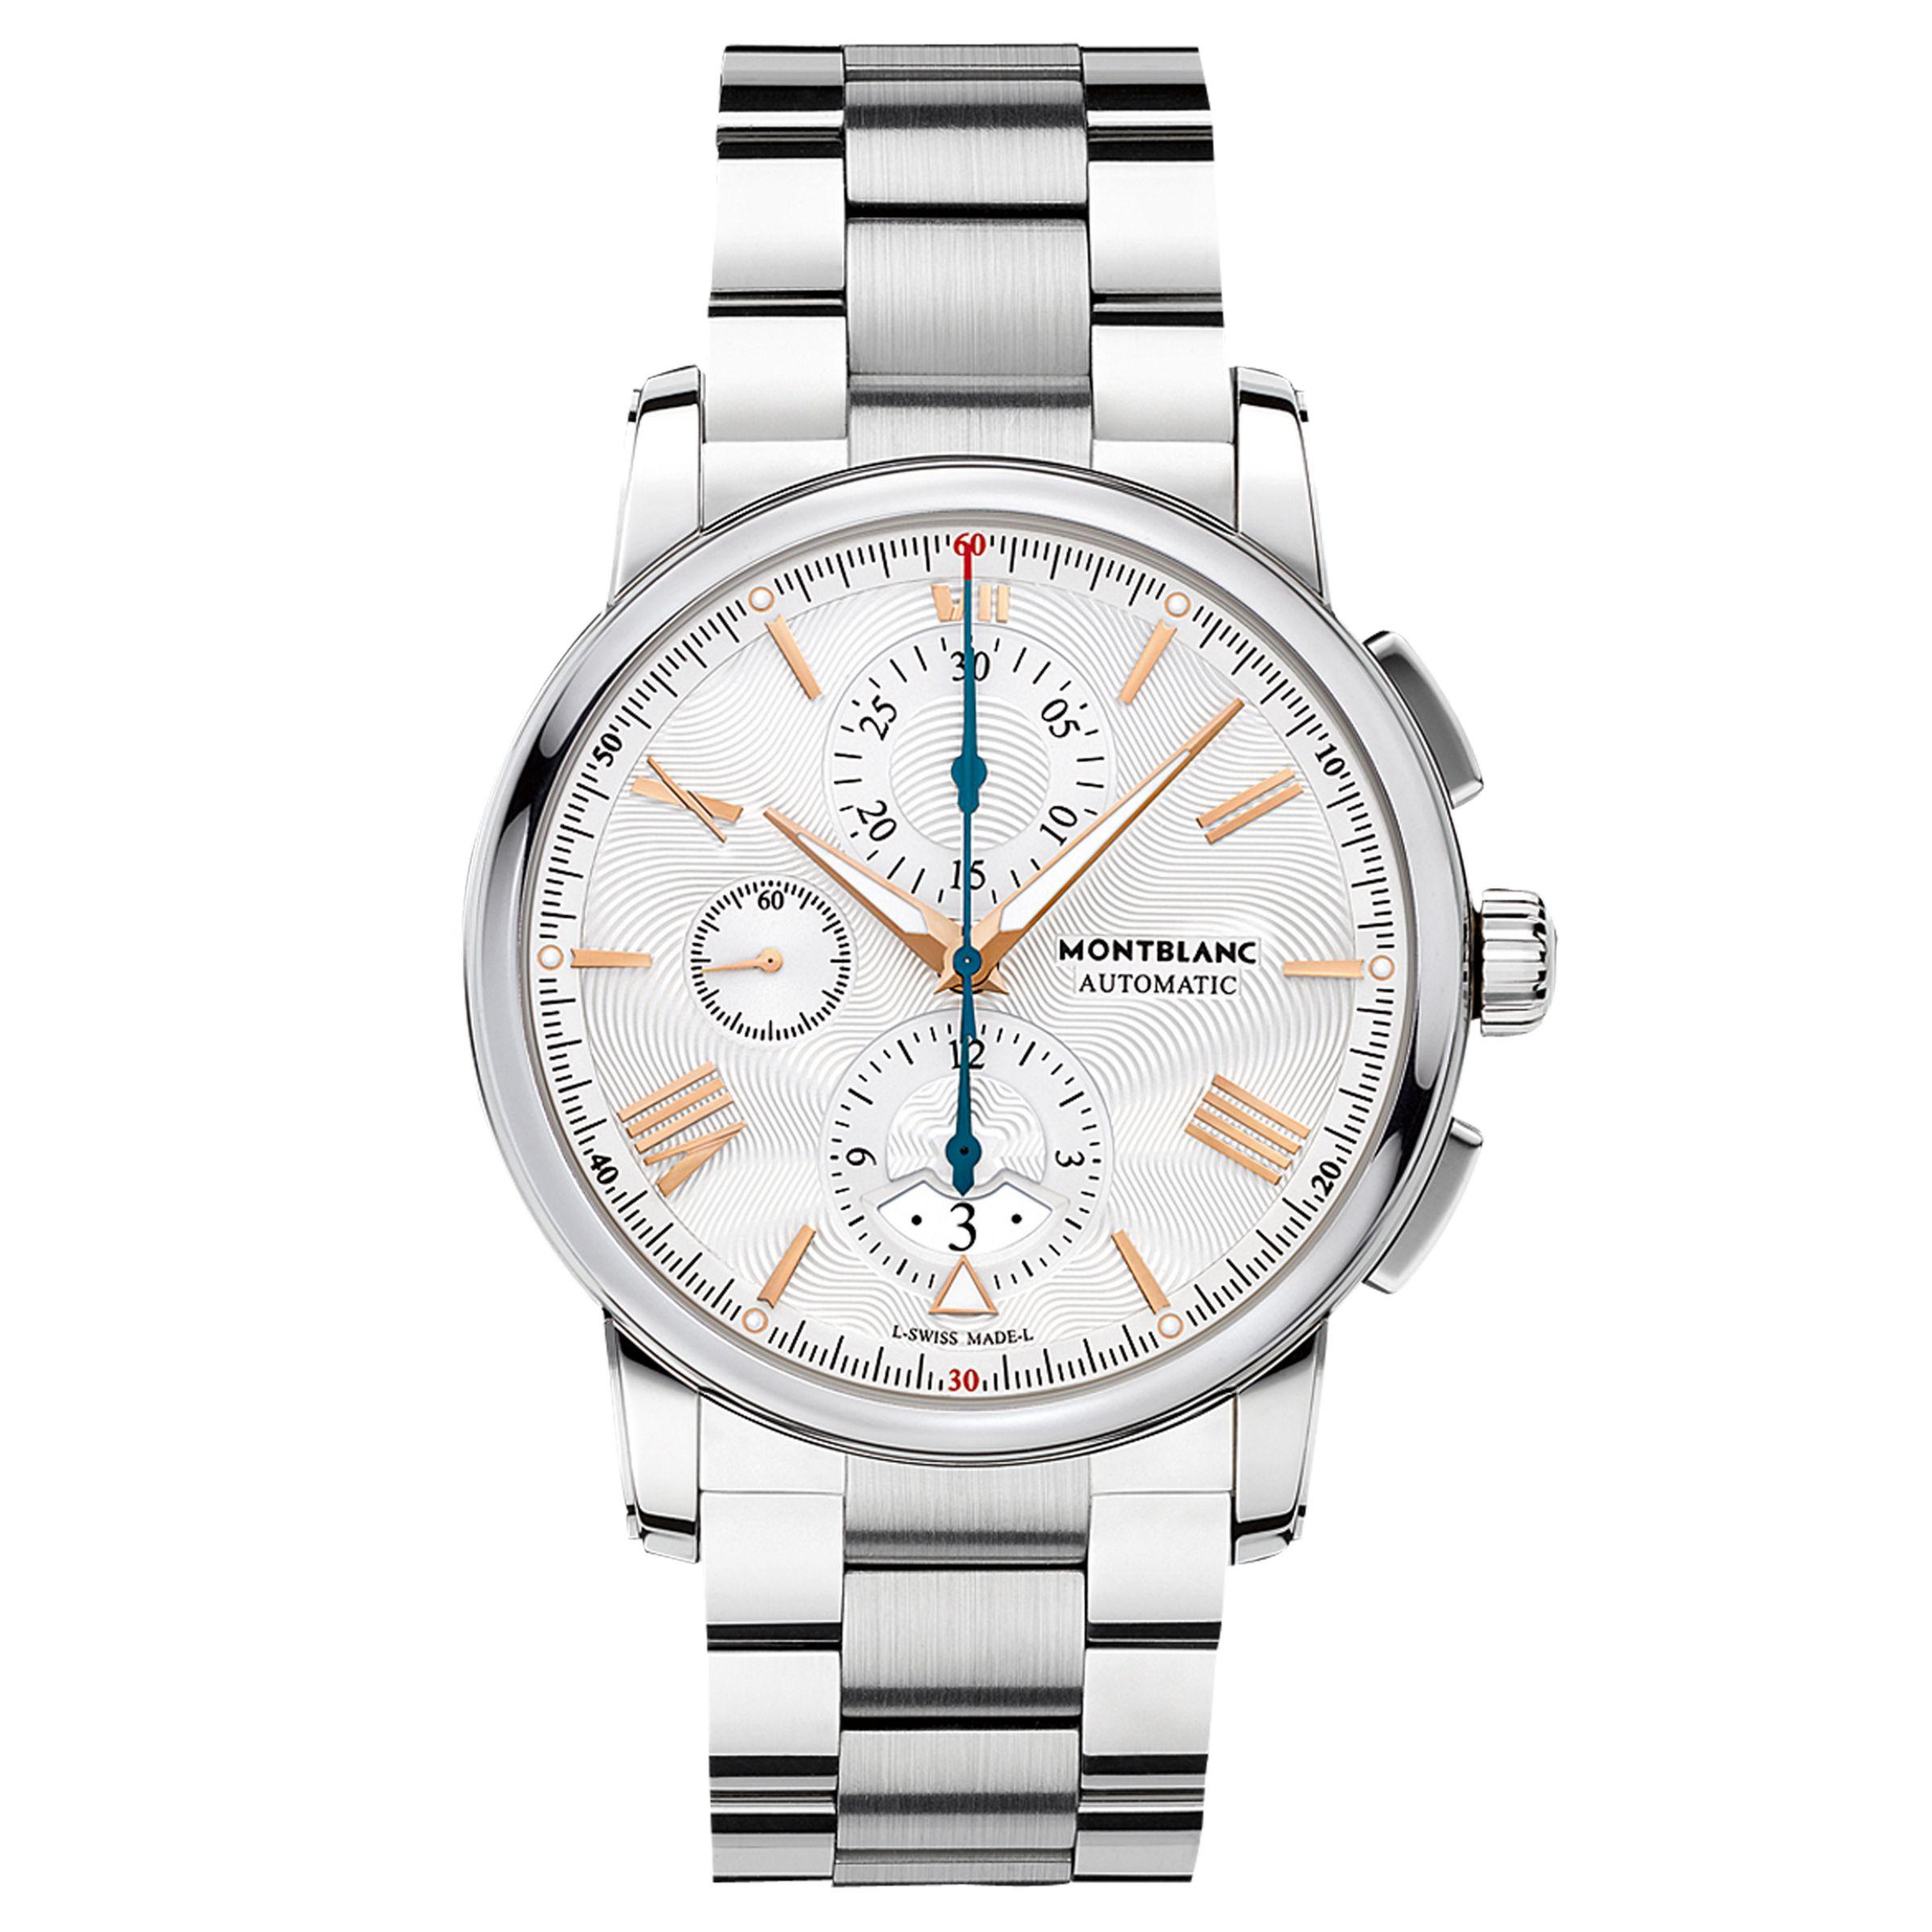 Montblanc Montblanc 114856 Men's 4810 Automatic Chronograph Date Bracelet Strap Watch, Silver/White